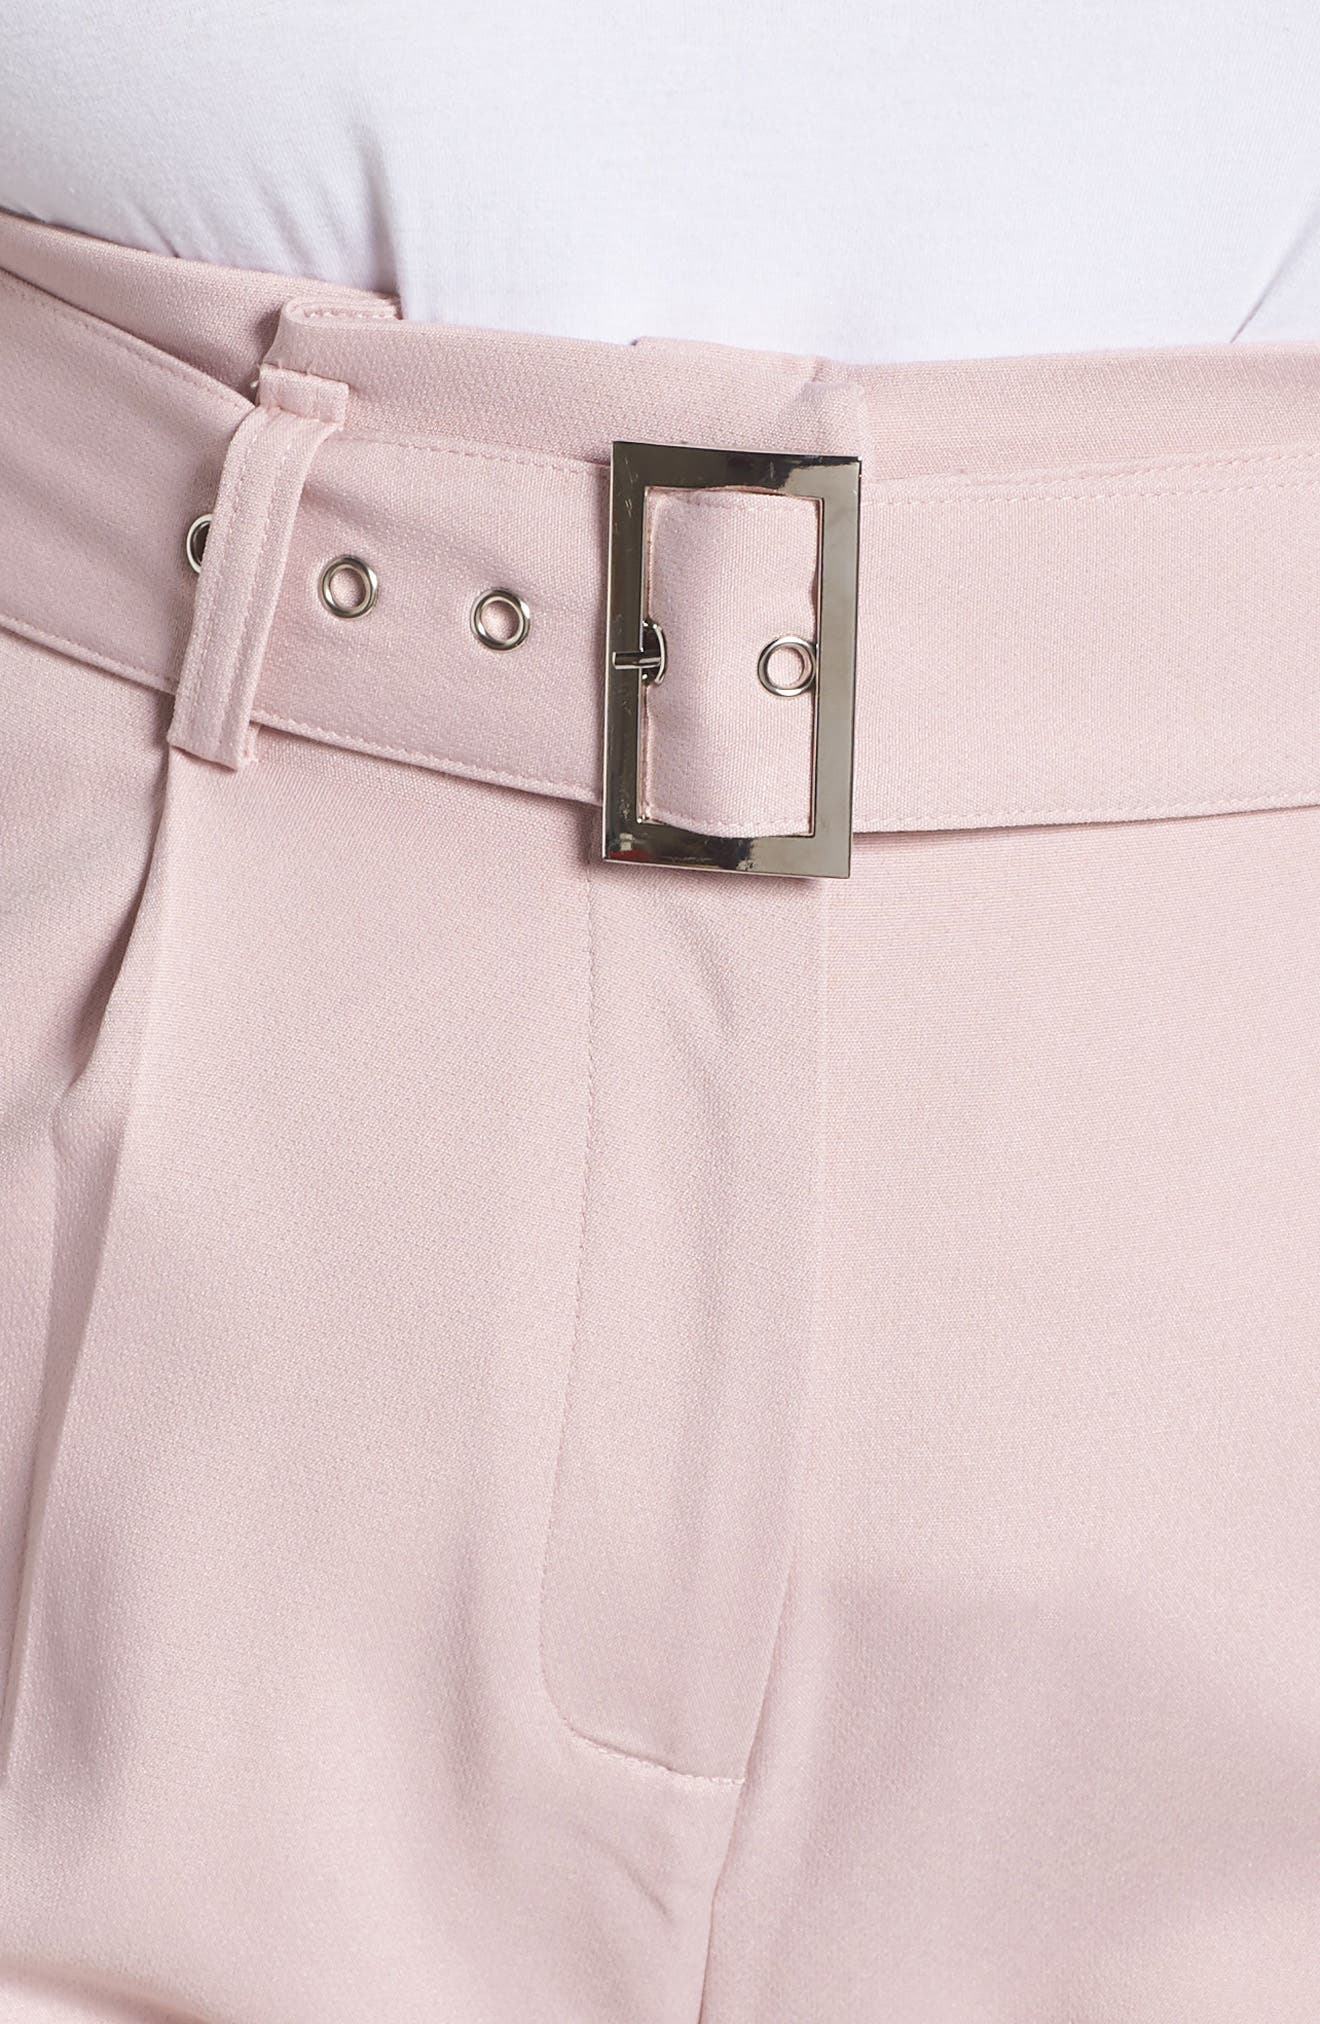 Belted Peg Trousers,                             Alternate thumbnail 4, color,                             Blush